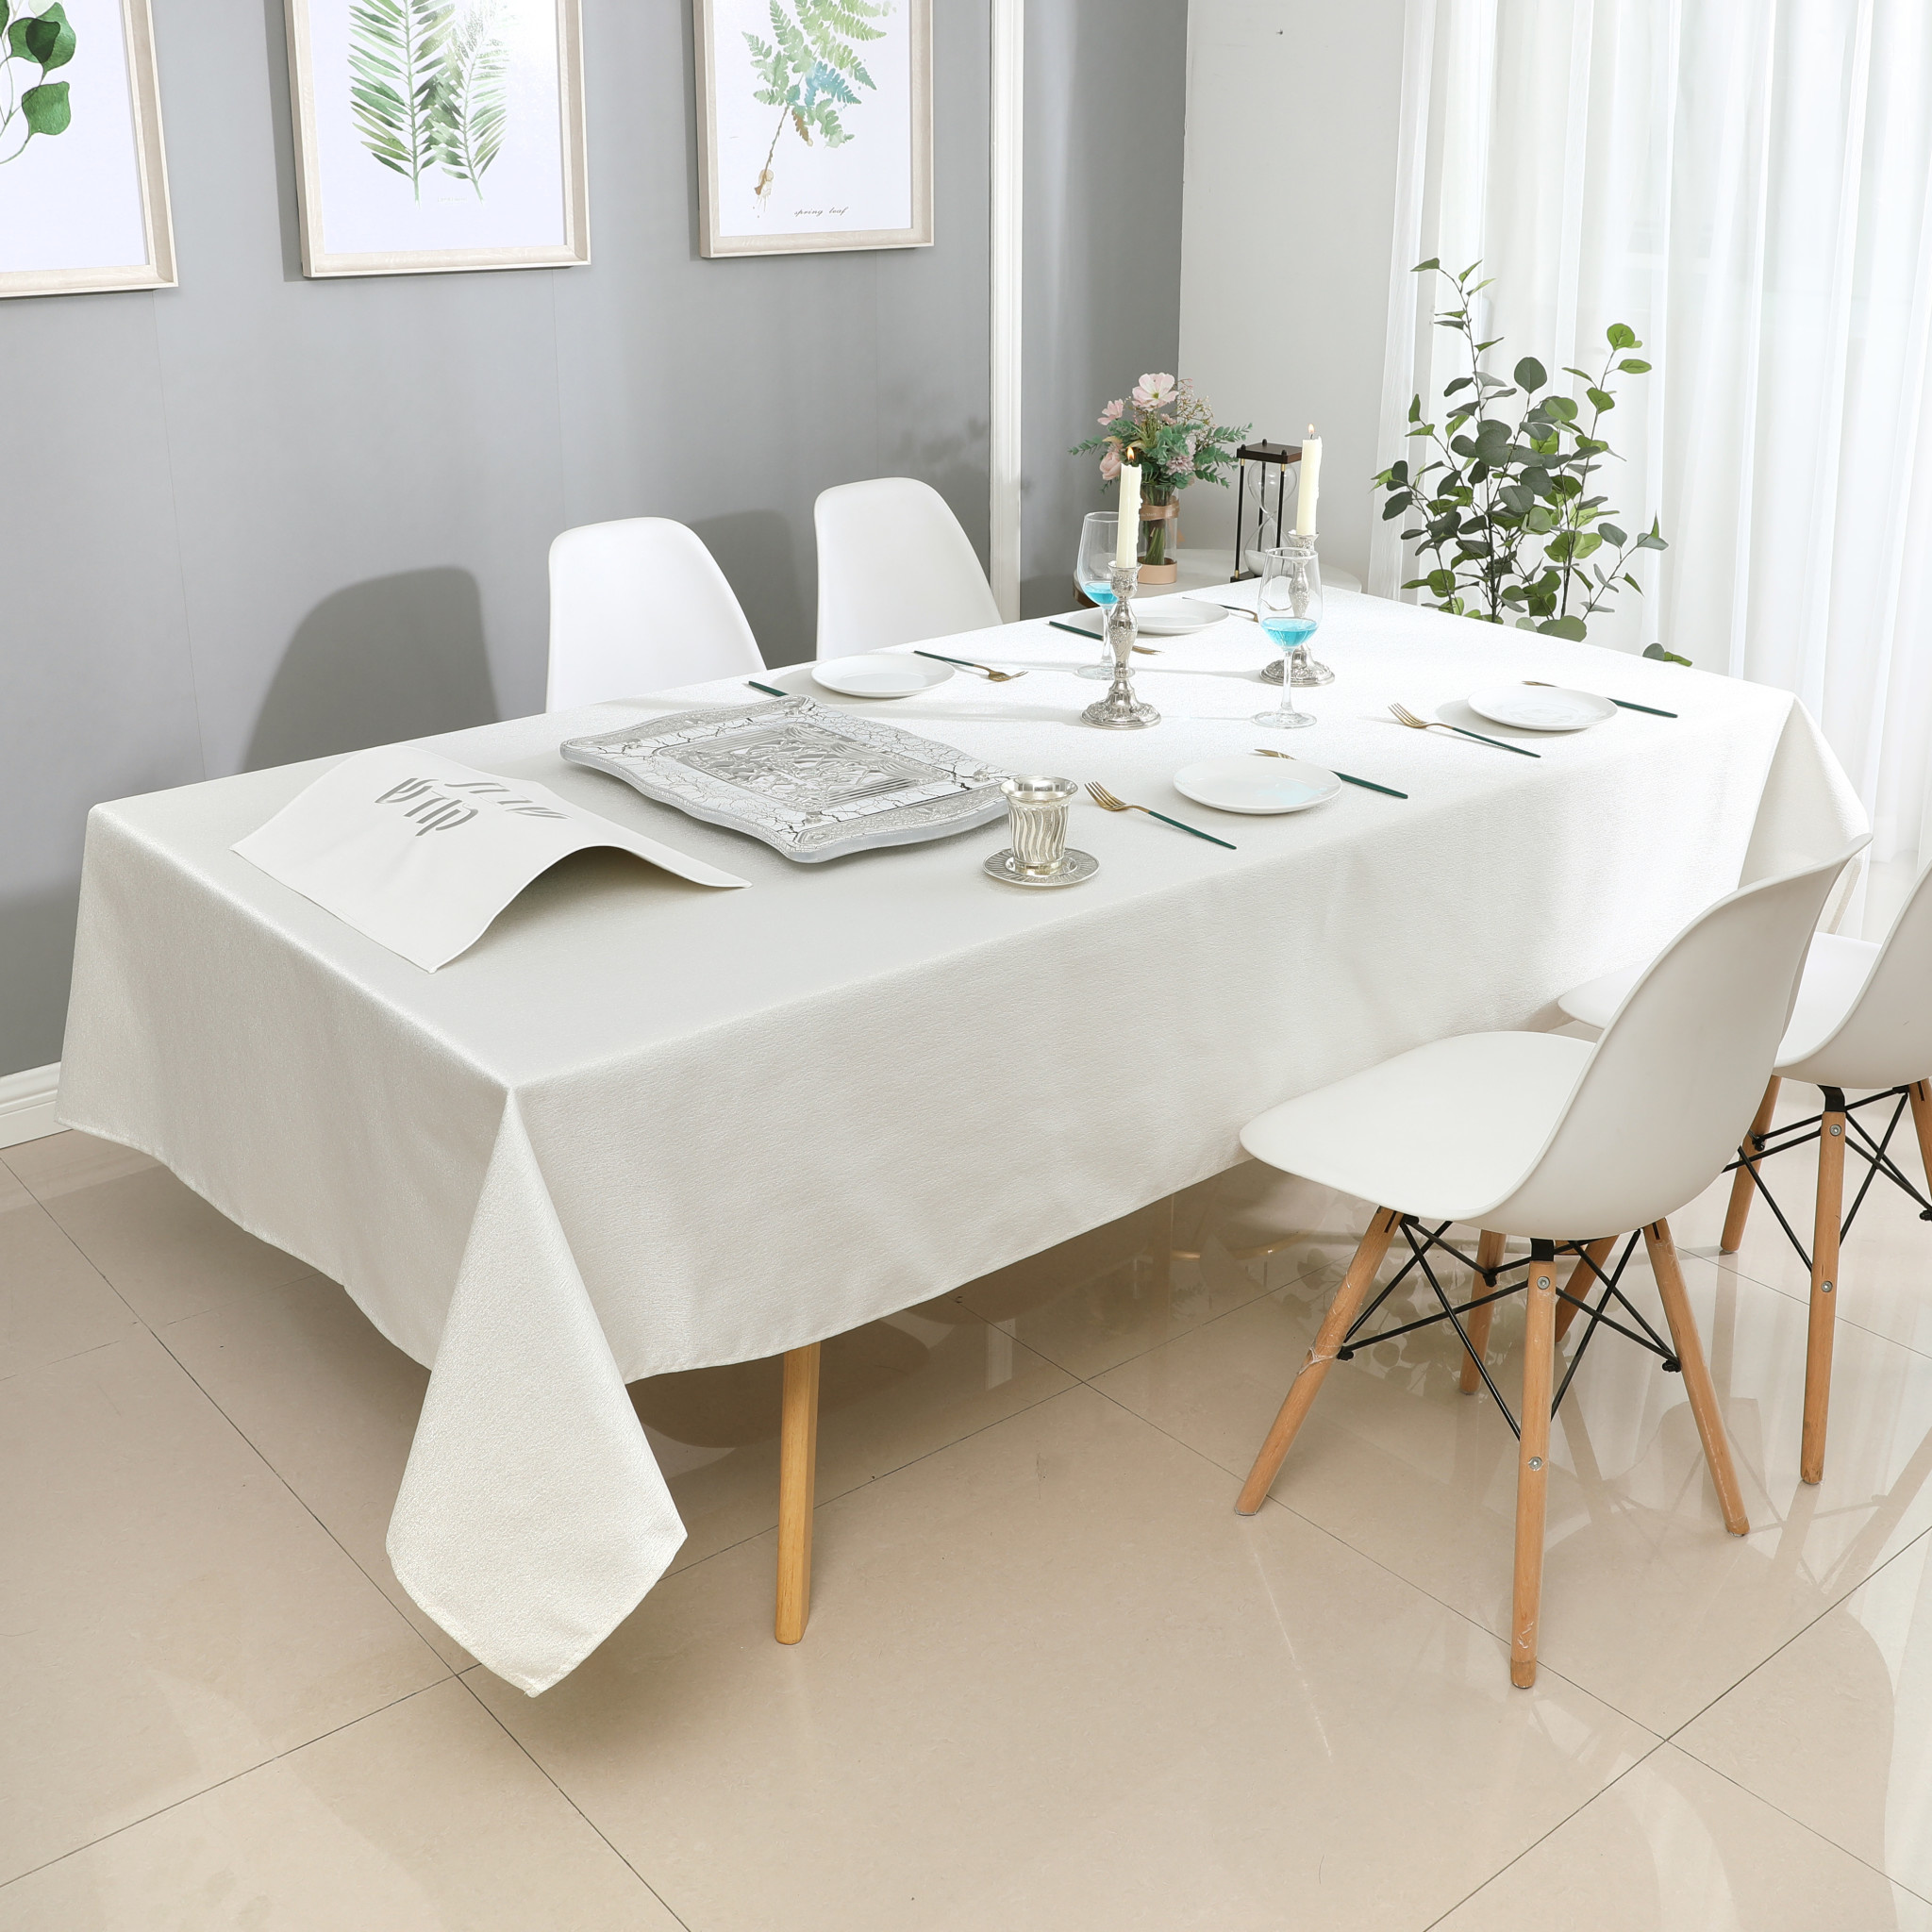 TC1326- 70 x 160 Jacquard White Silver Tablecloth